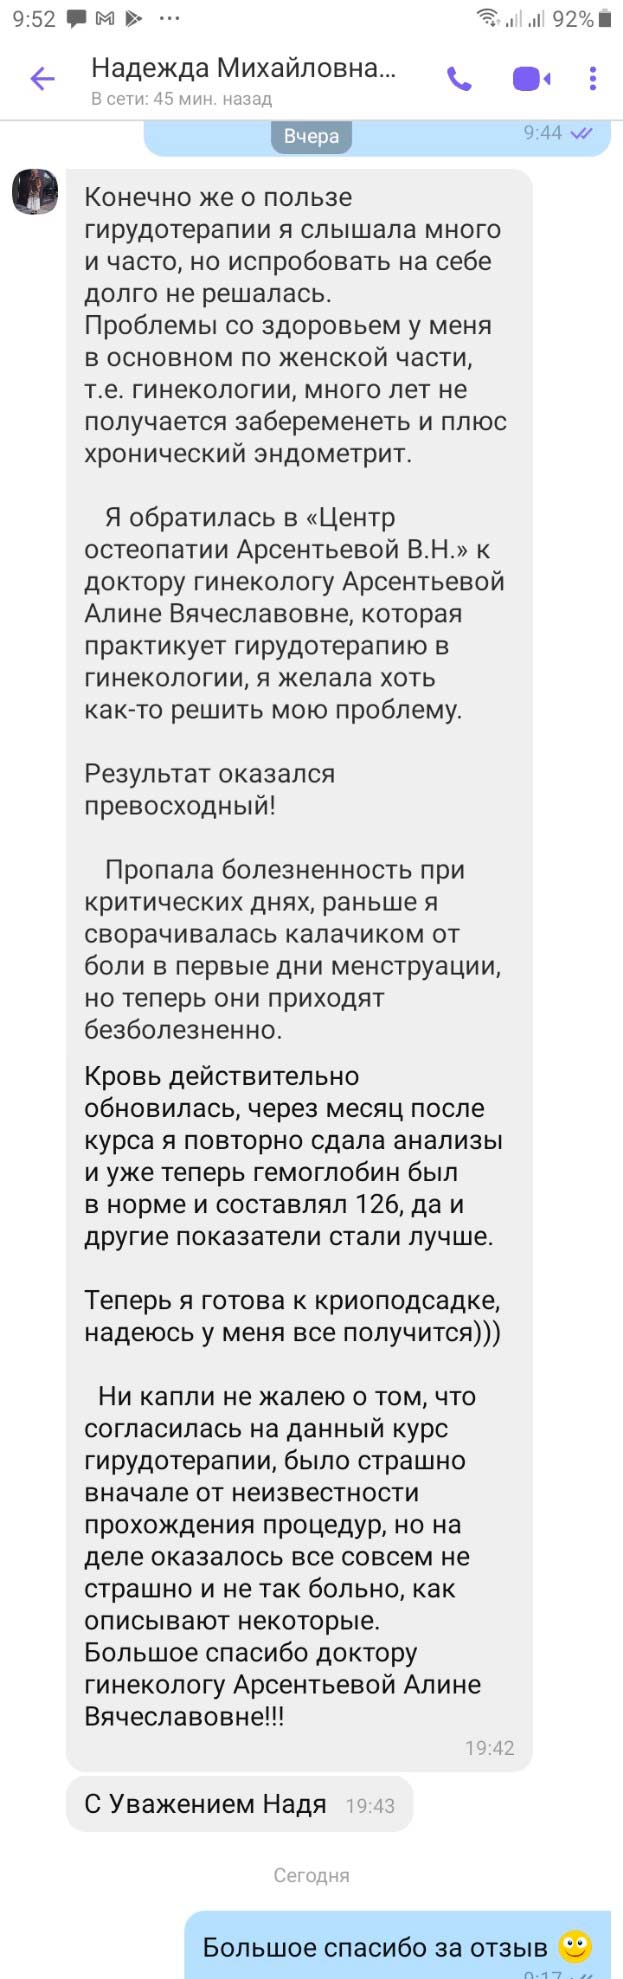 Отзыв пациента о гирудотерапии №2 - Арсентьева Алина